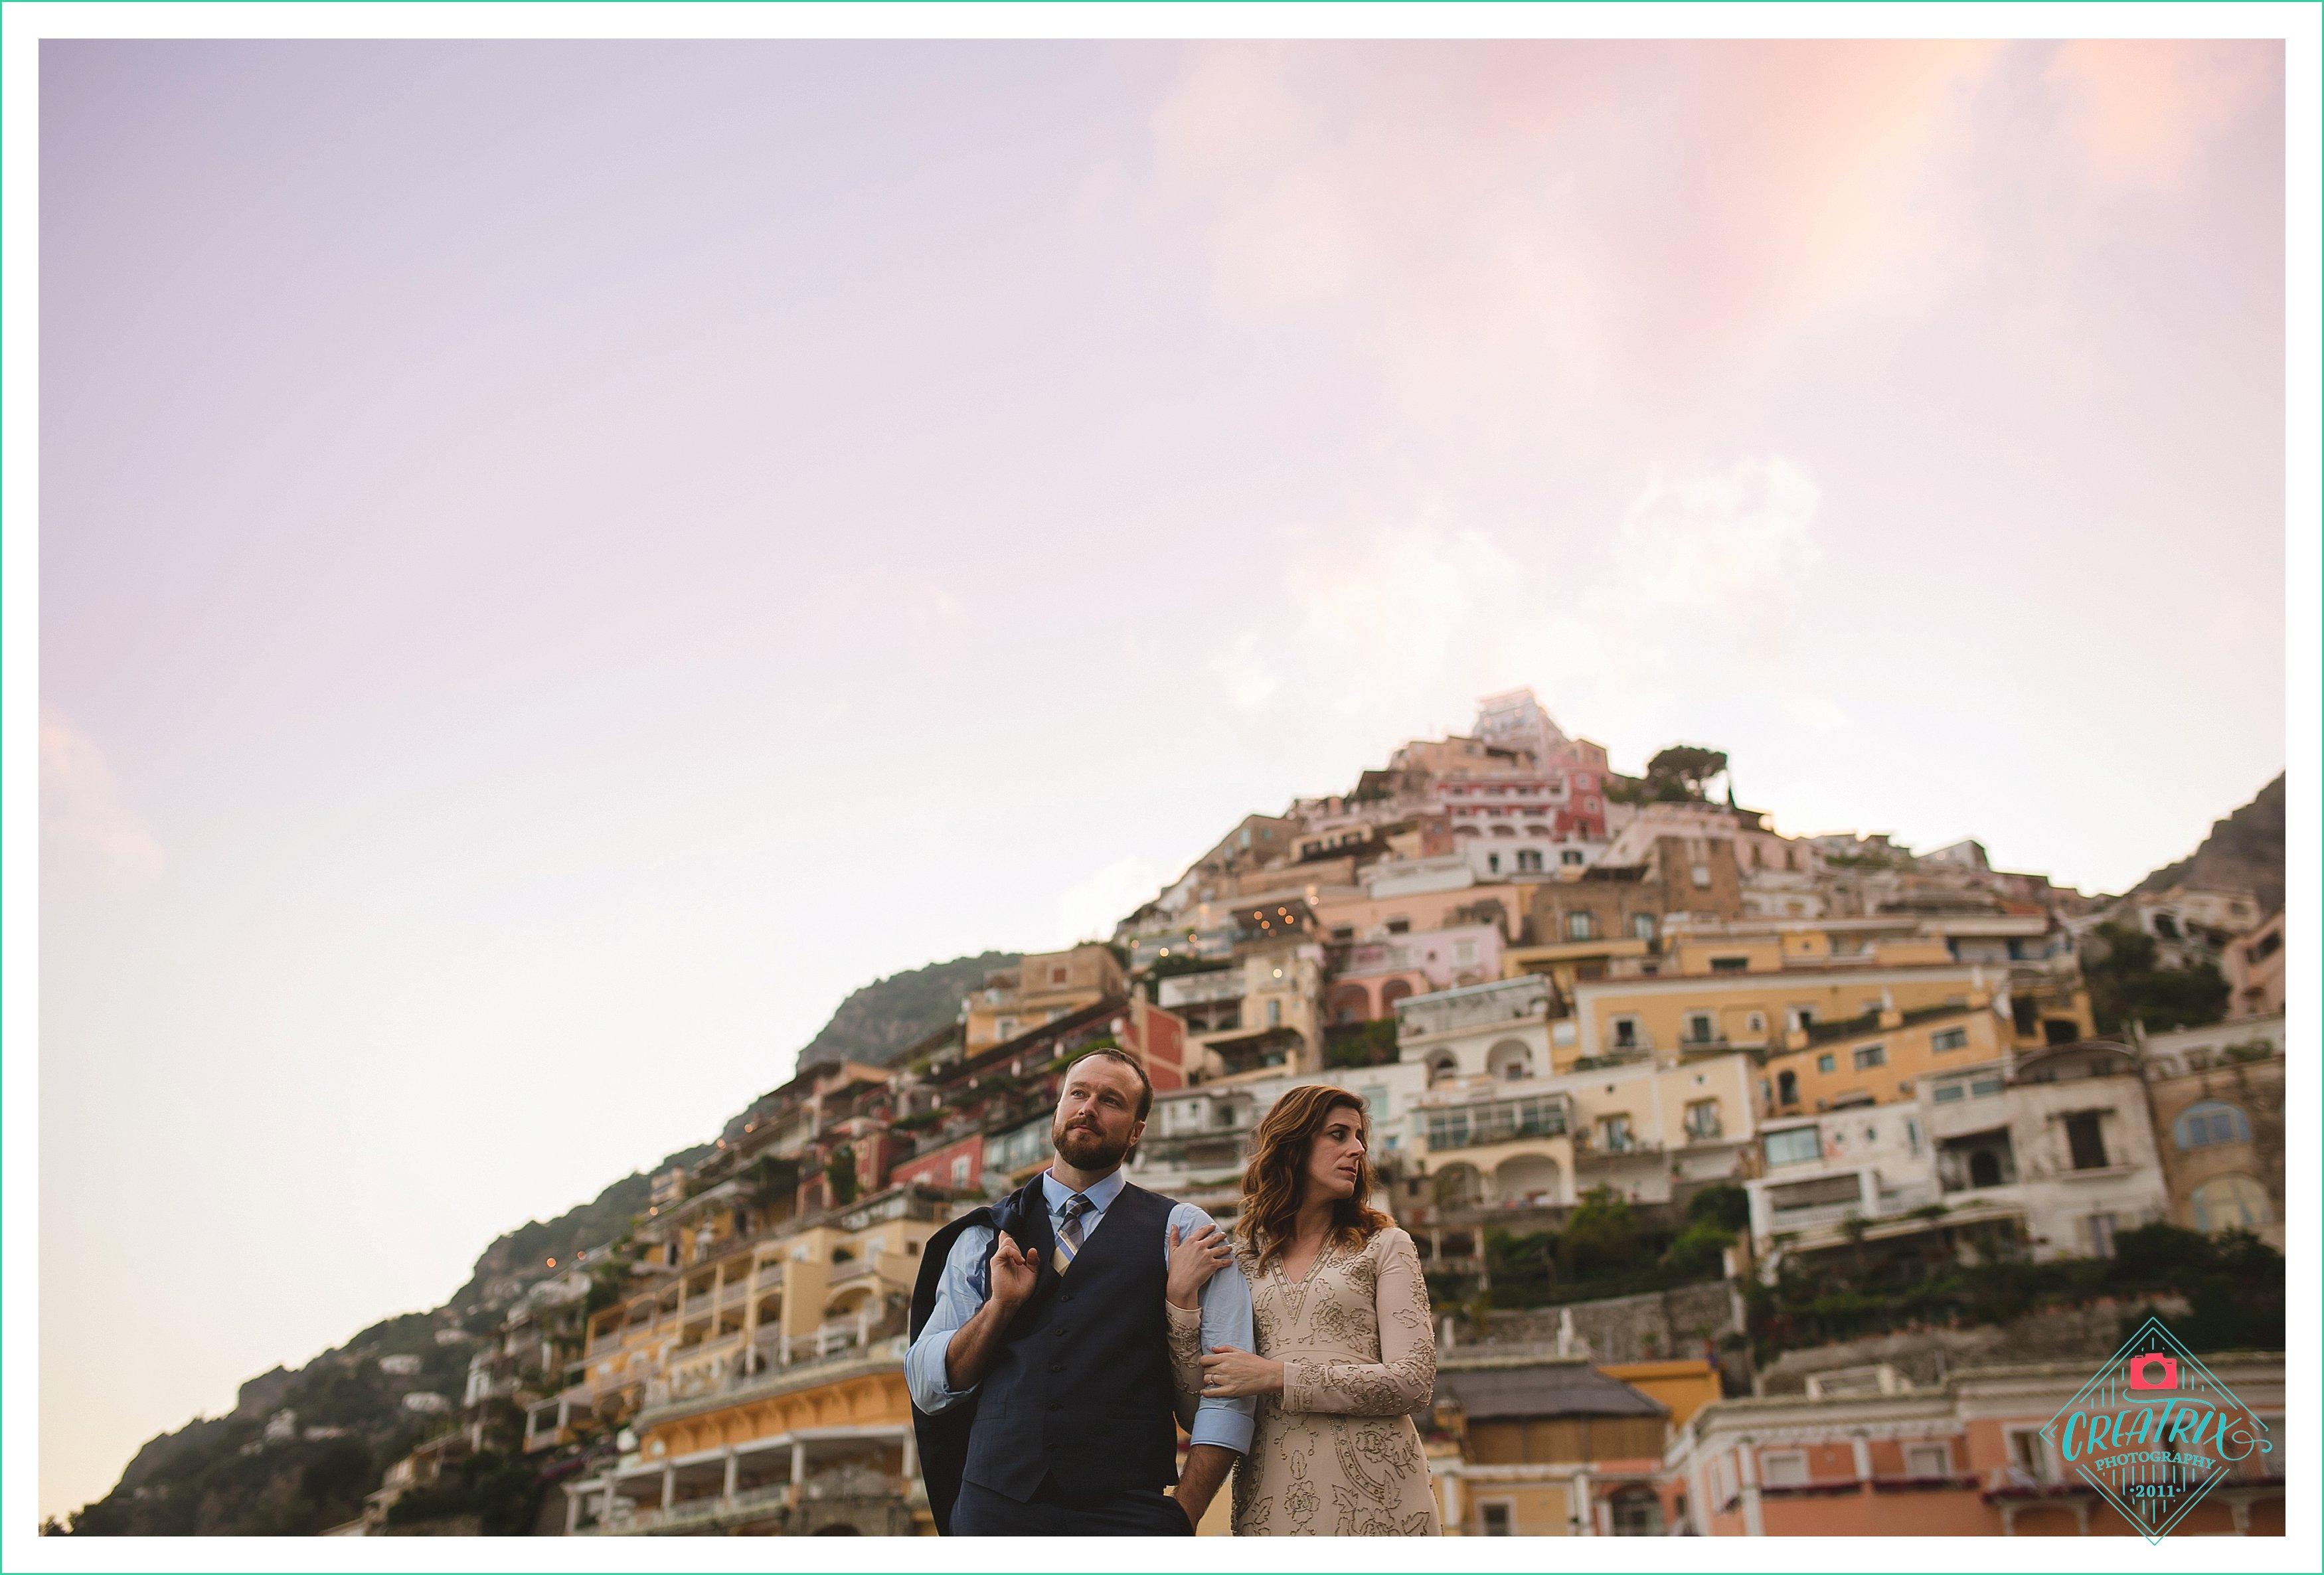 Andrea and Scott // Positano Elopement Photographer